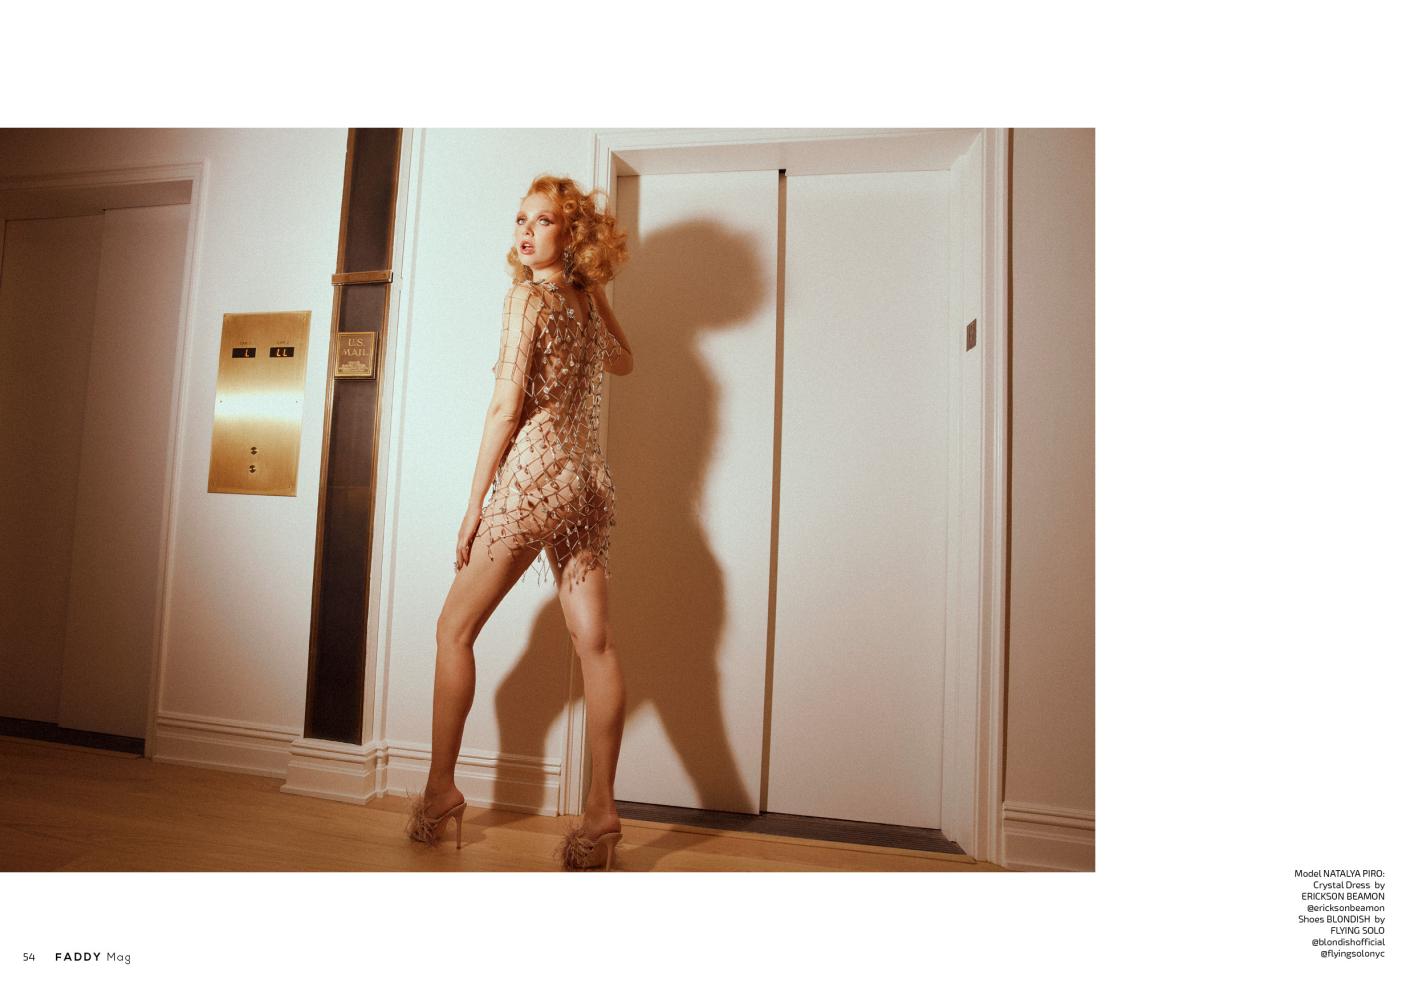 Natalya Piro for FADDY Magazine